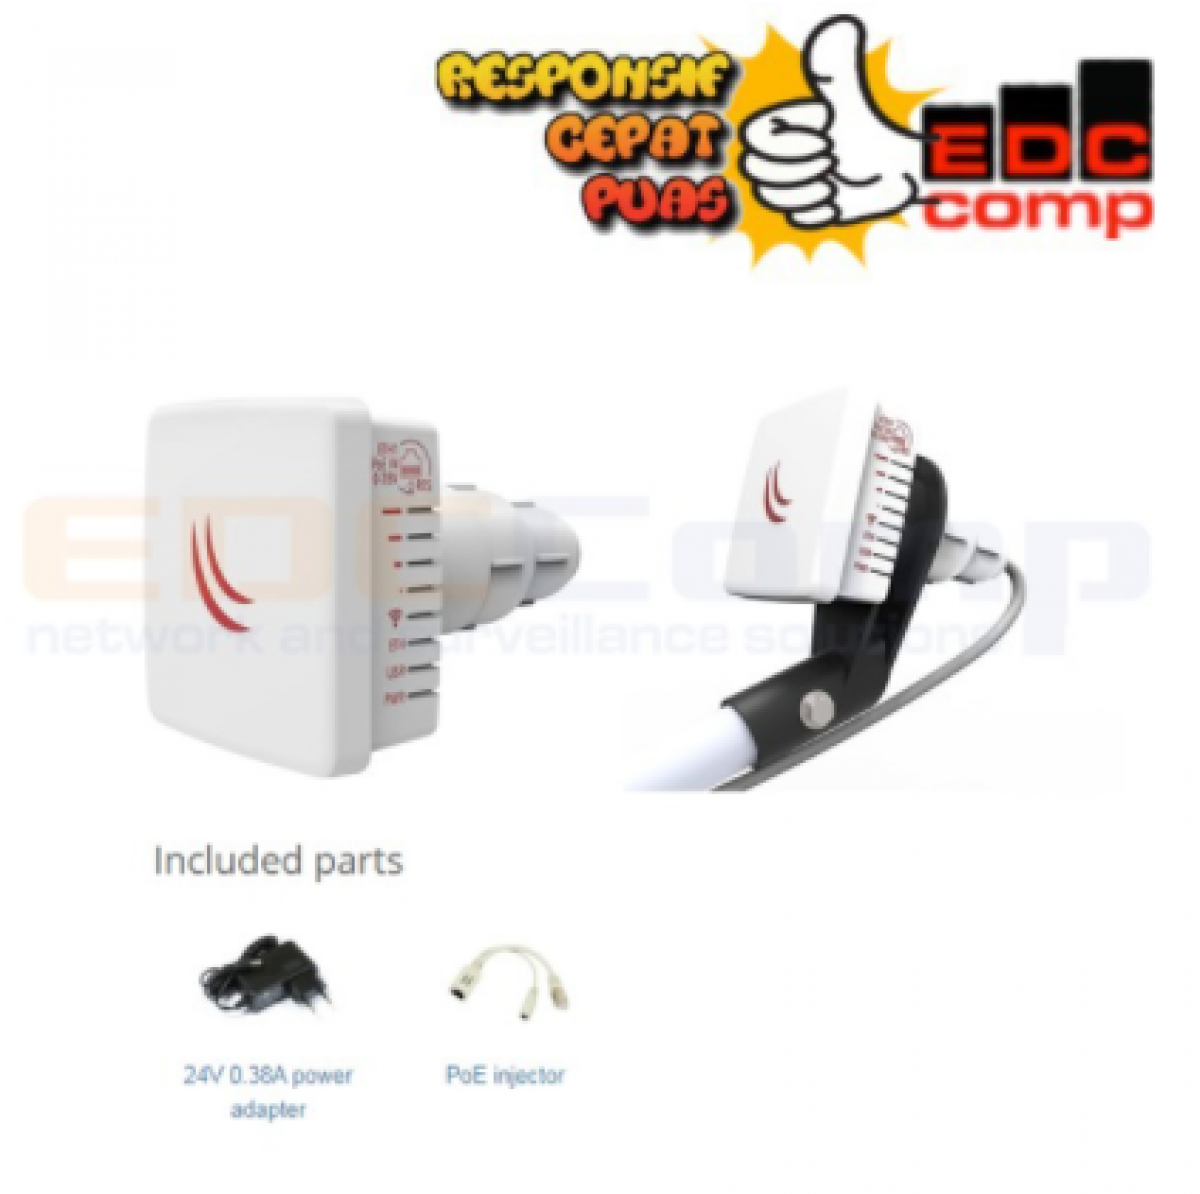 Mikrotik RBLDF-5nD LDF 5ND RBLDF5nD Embedded Wireless - EdcComp